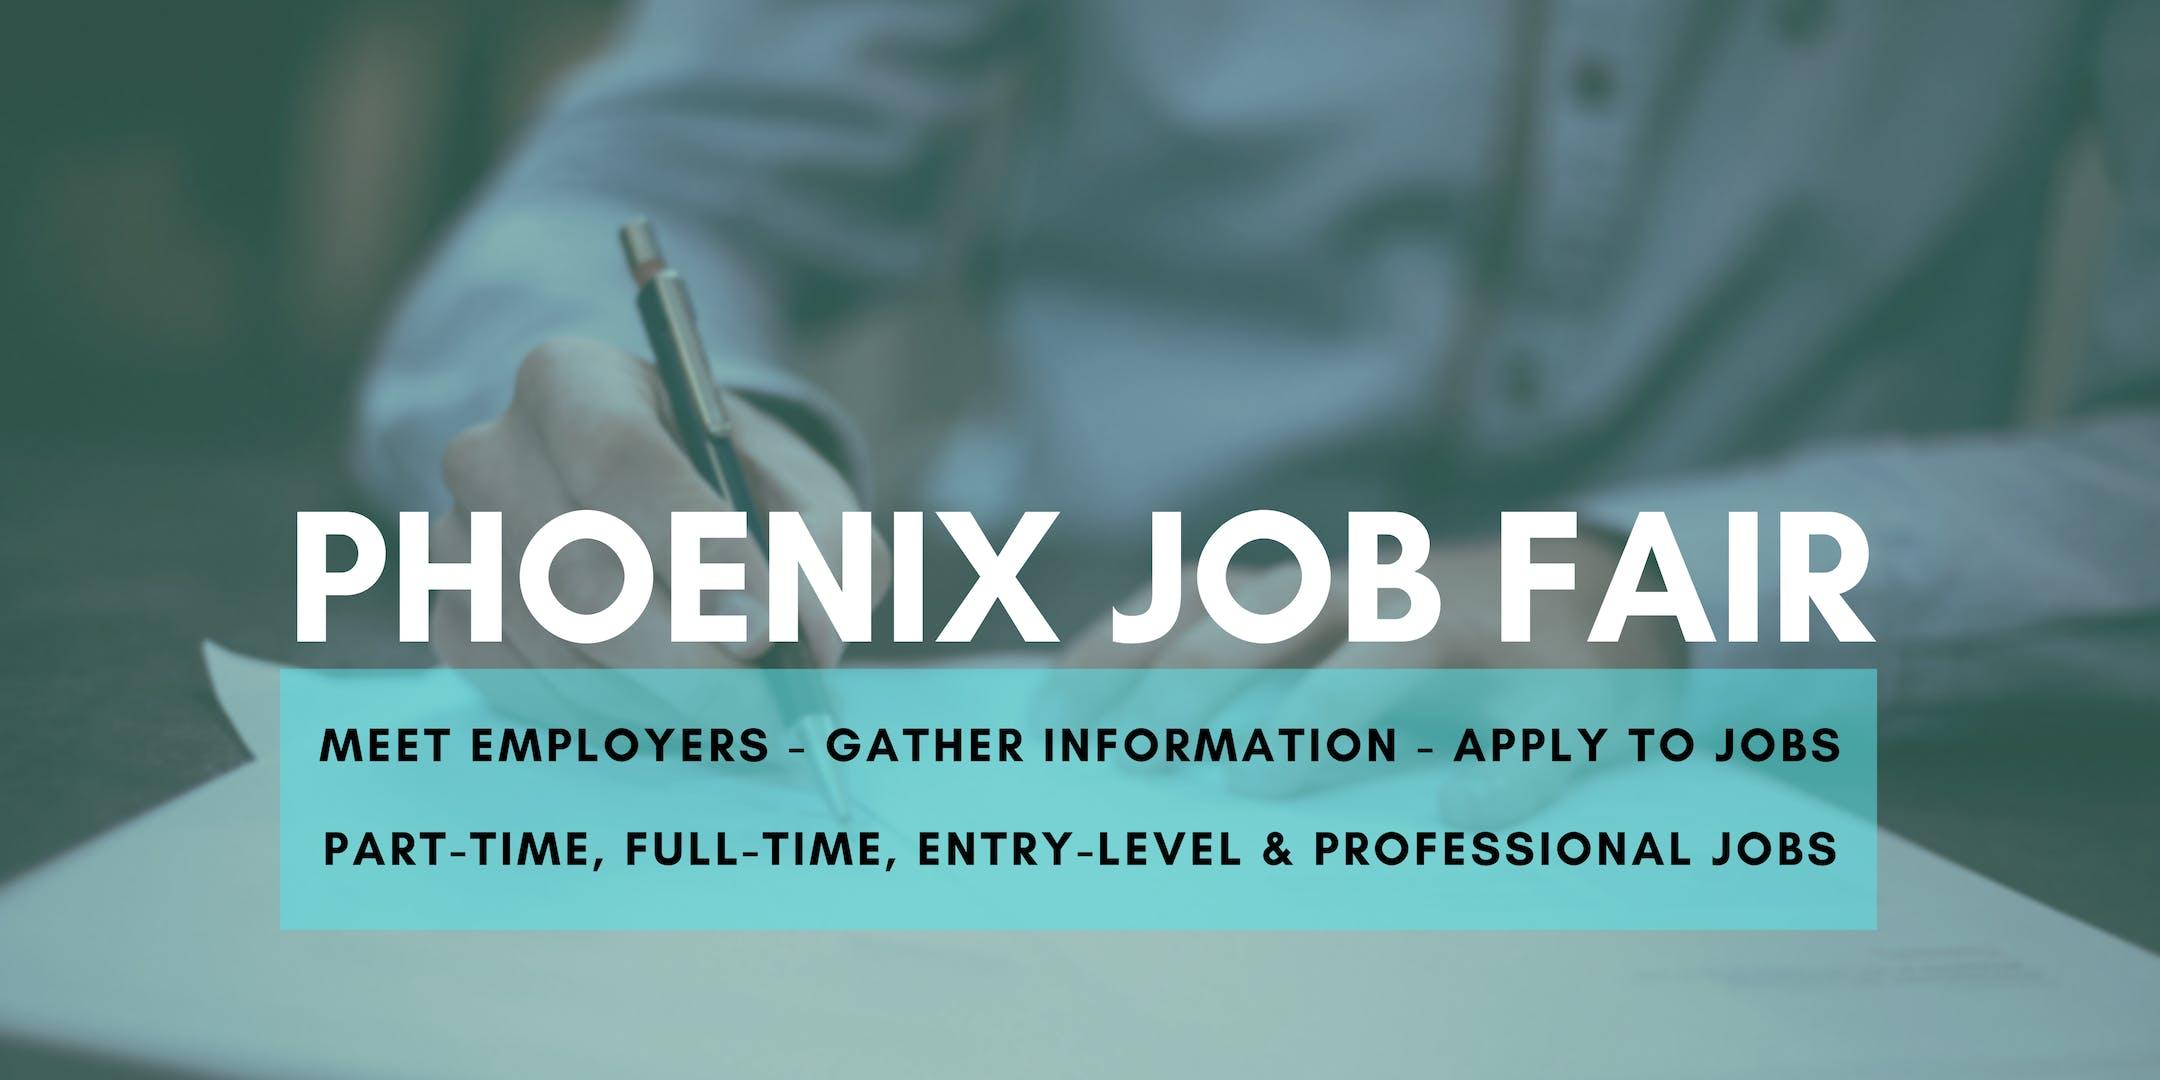 Phoenix Job Fair - October 14, 2019 Job Fairs & Hiring Events in Phoenix AZ